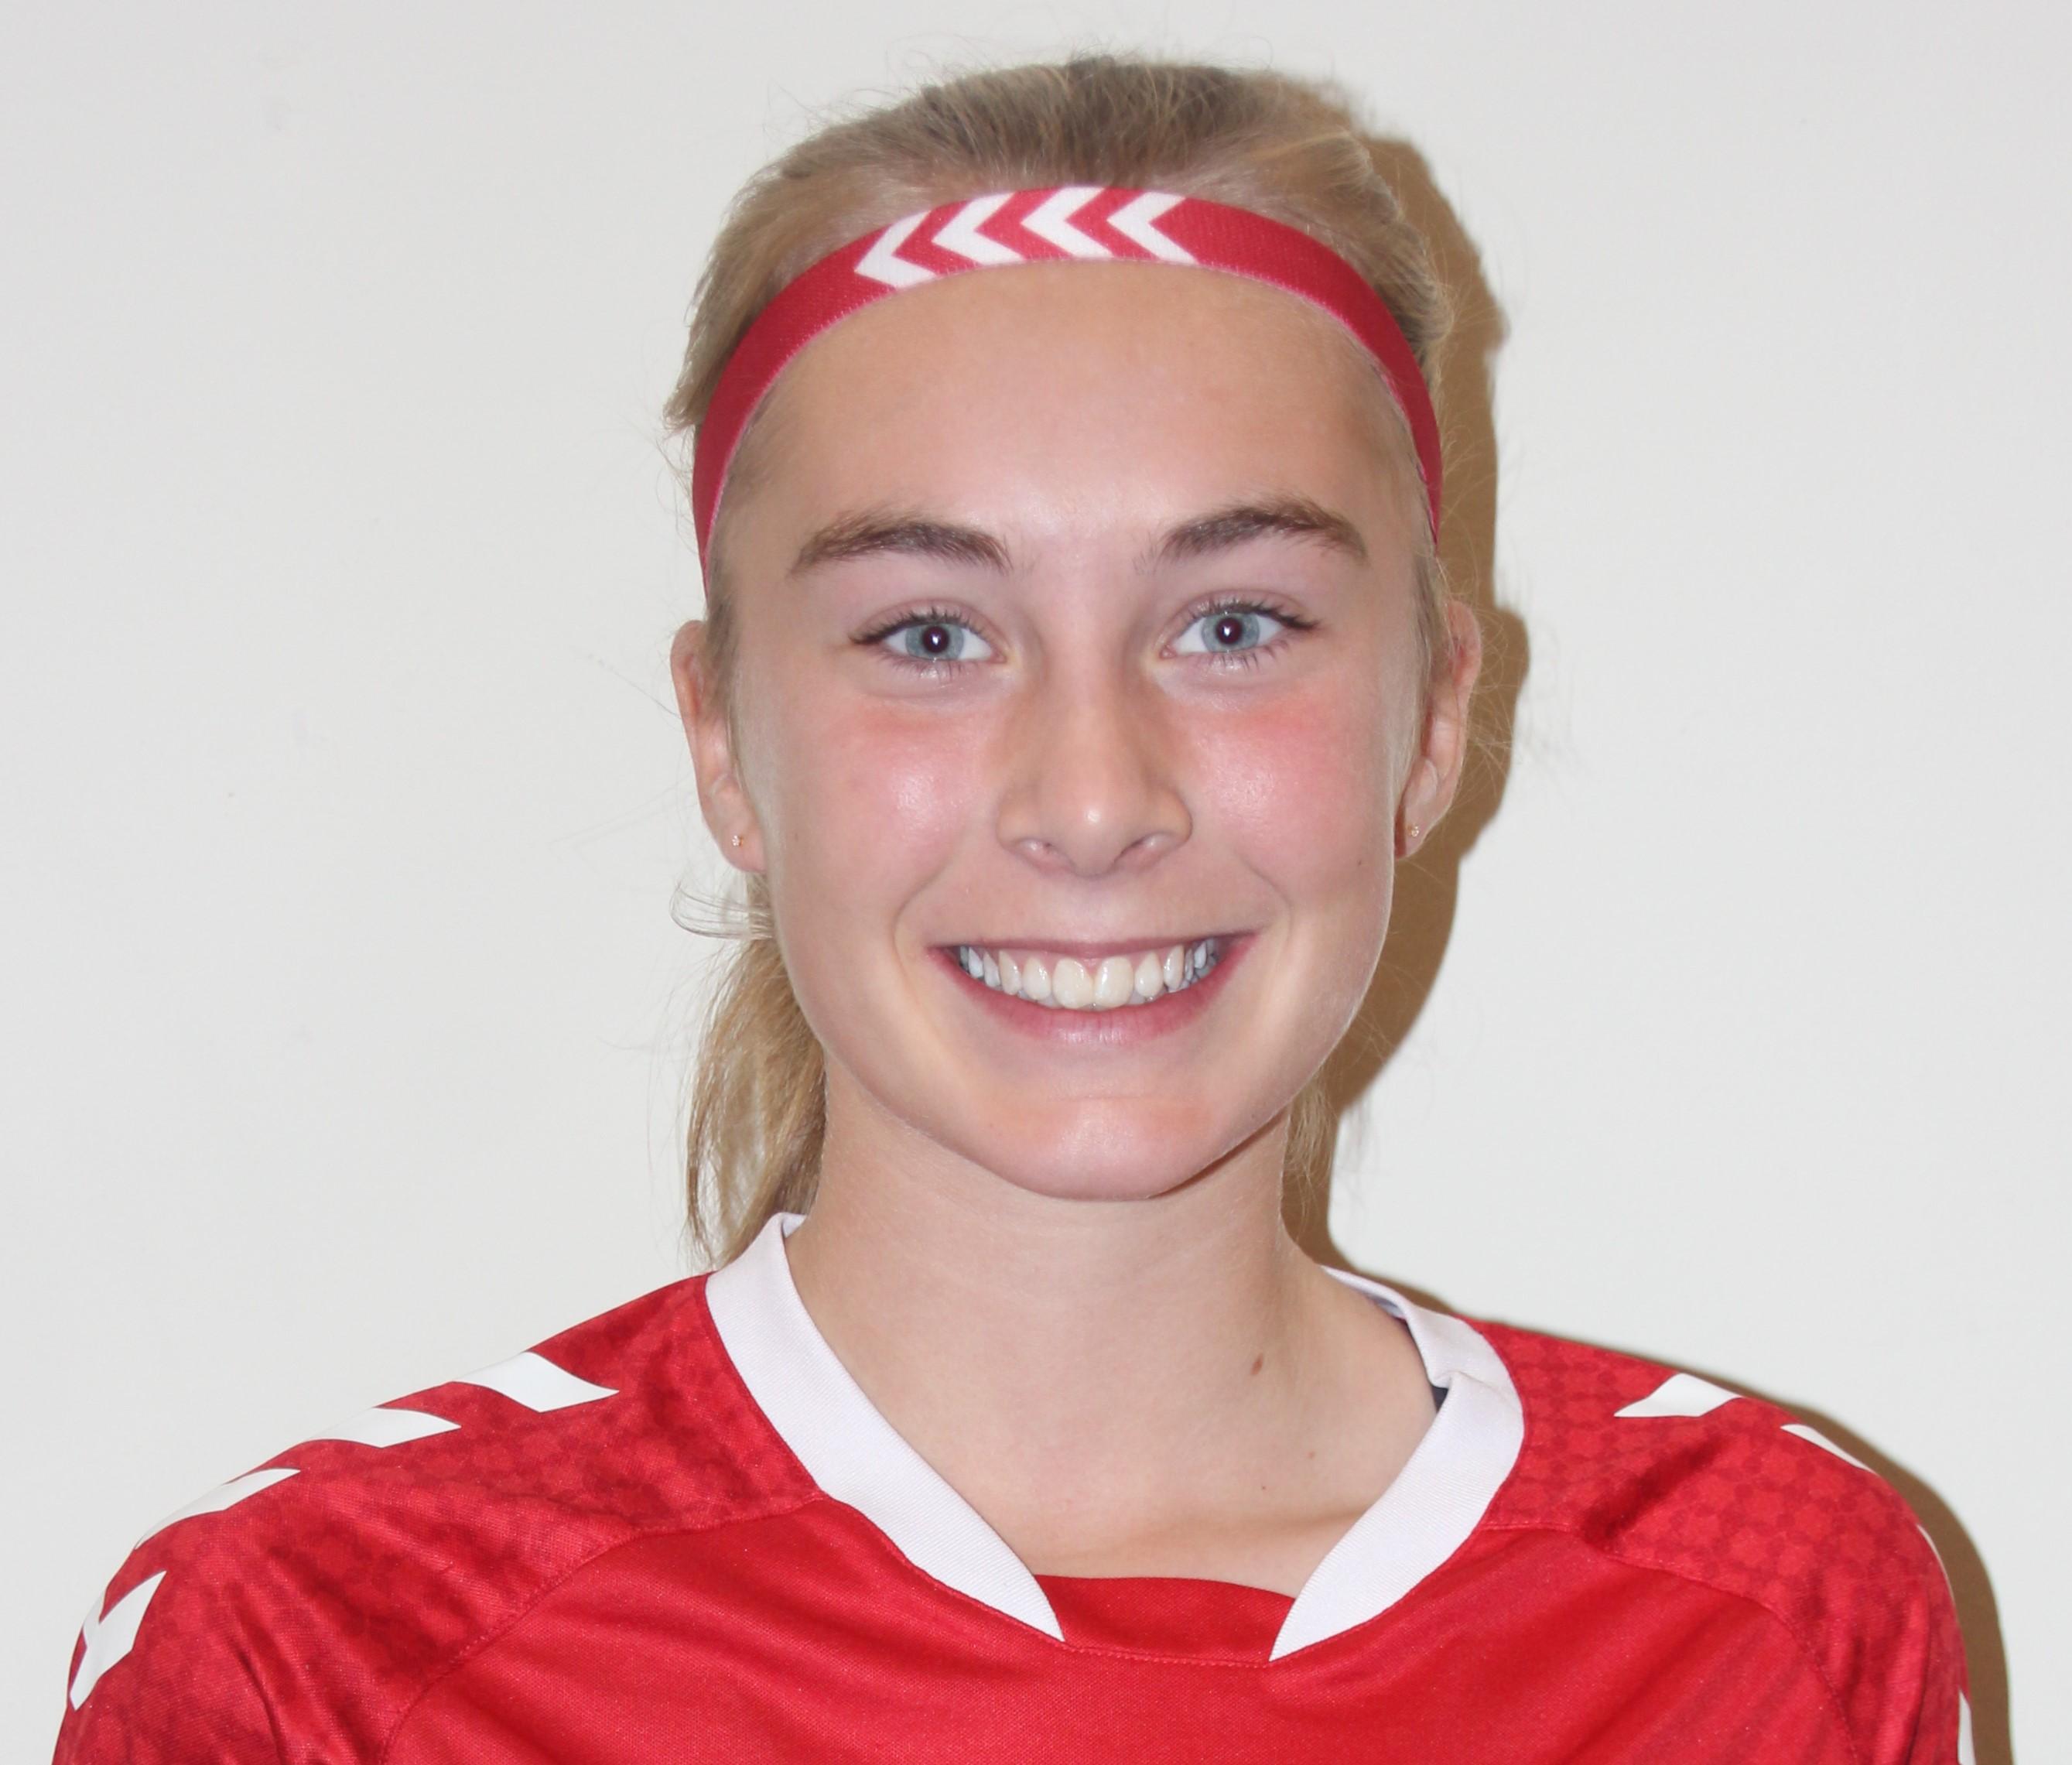 Julie Nonbøl Poulsen